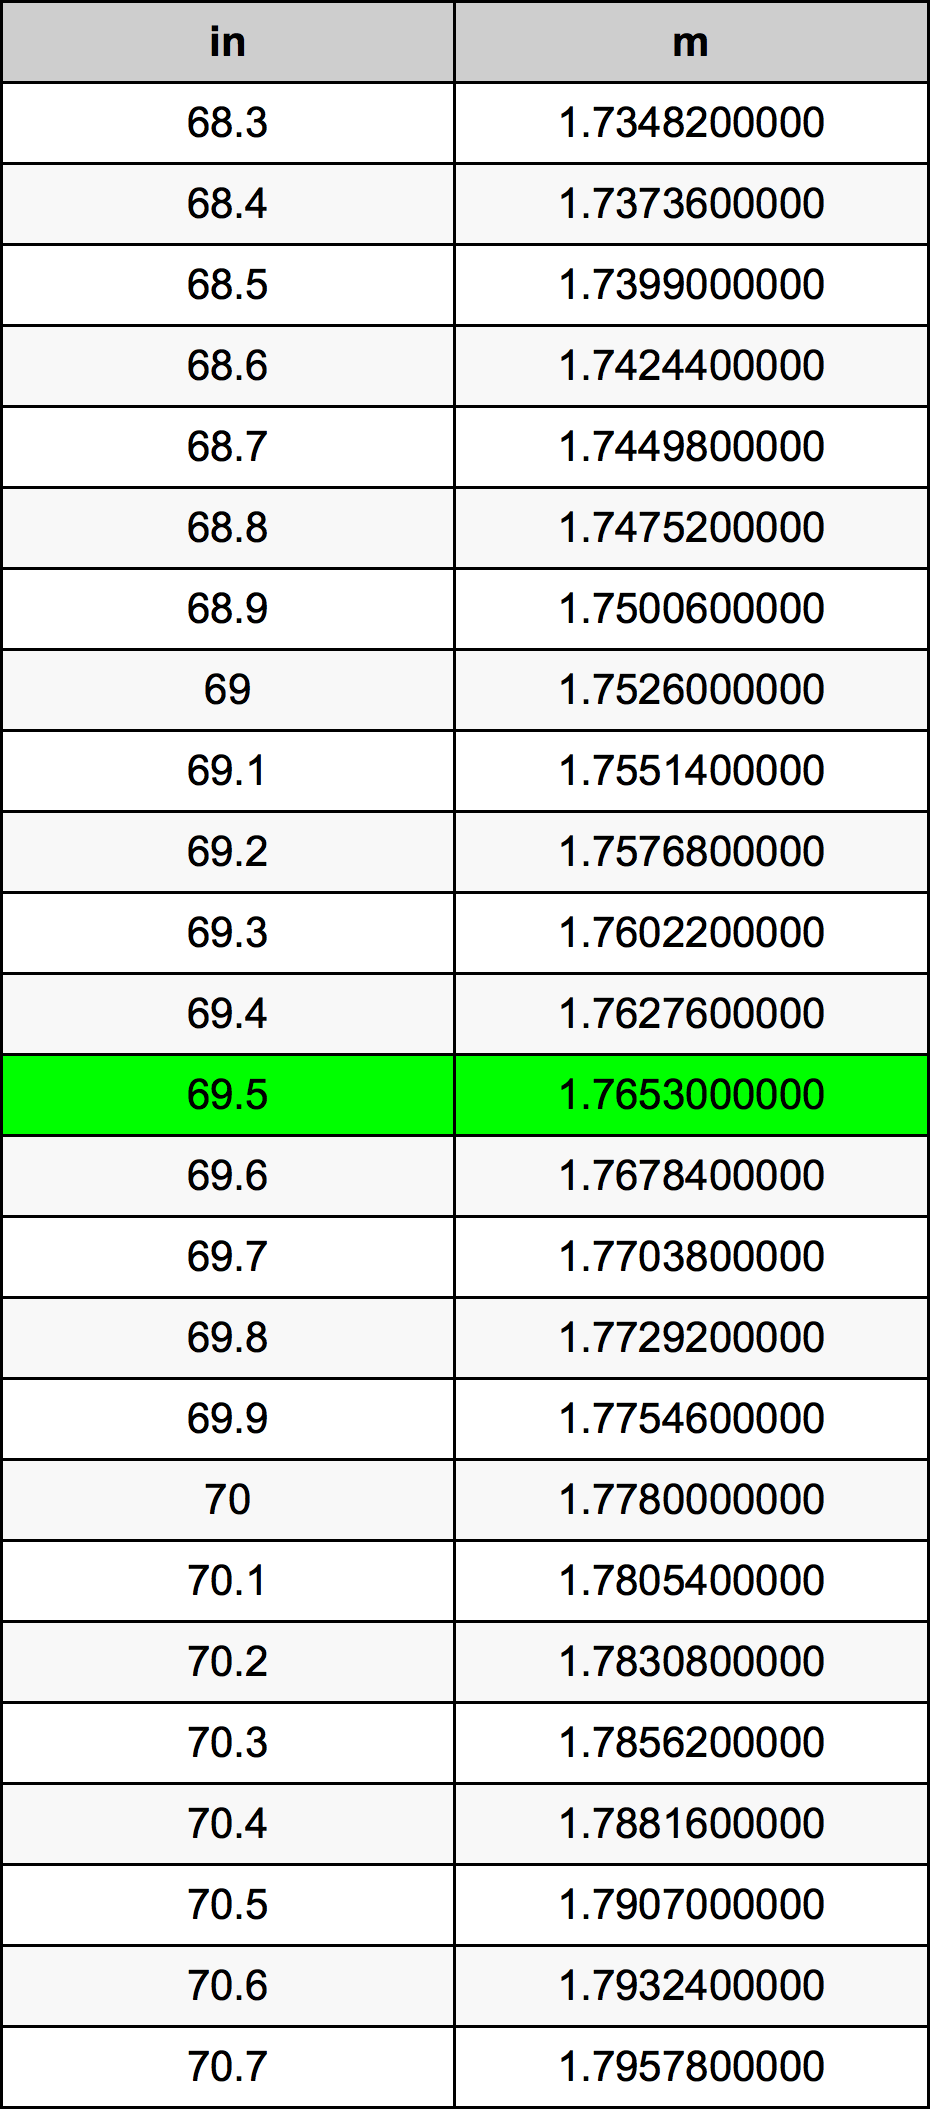 69.5 इंच रूपांतरण सारणी